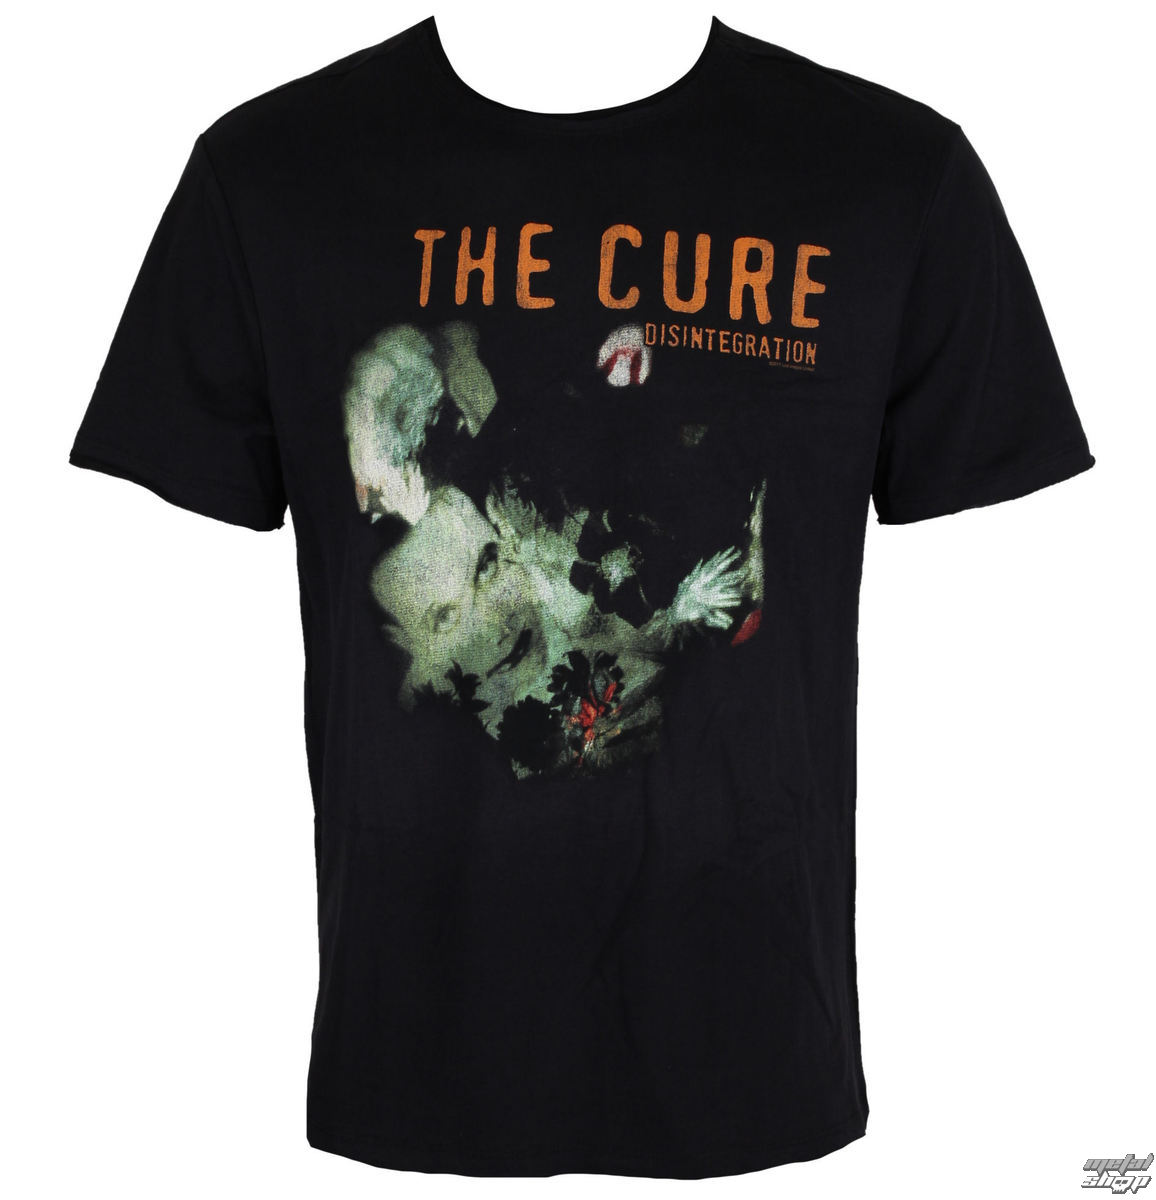 tričko pánske AMPLIFIED - the cure - desintegration - av210tcd